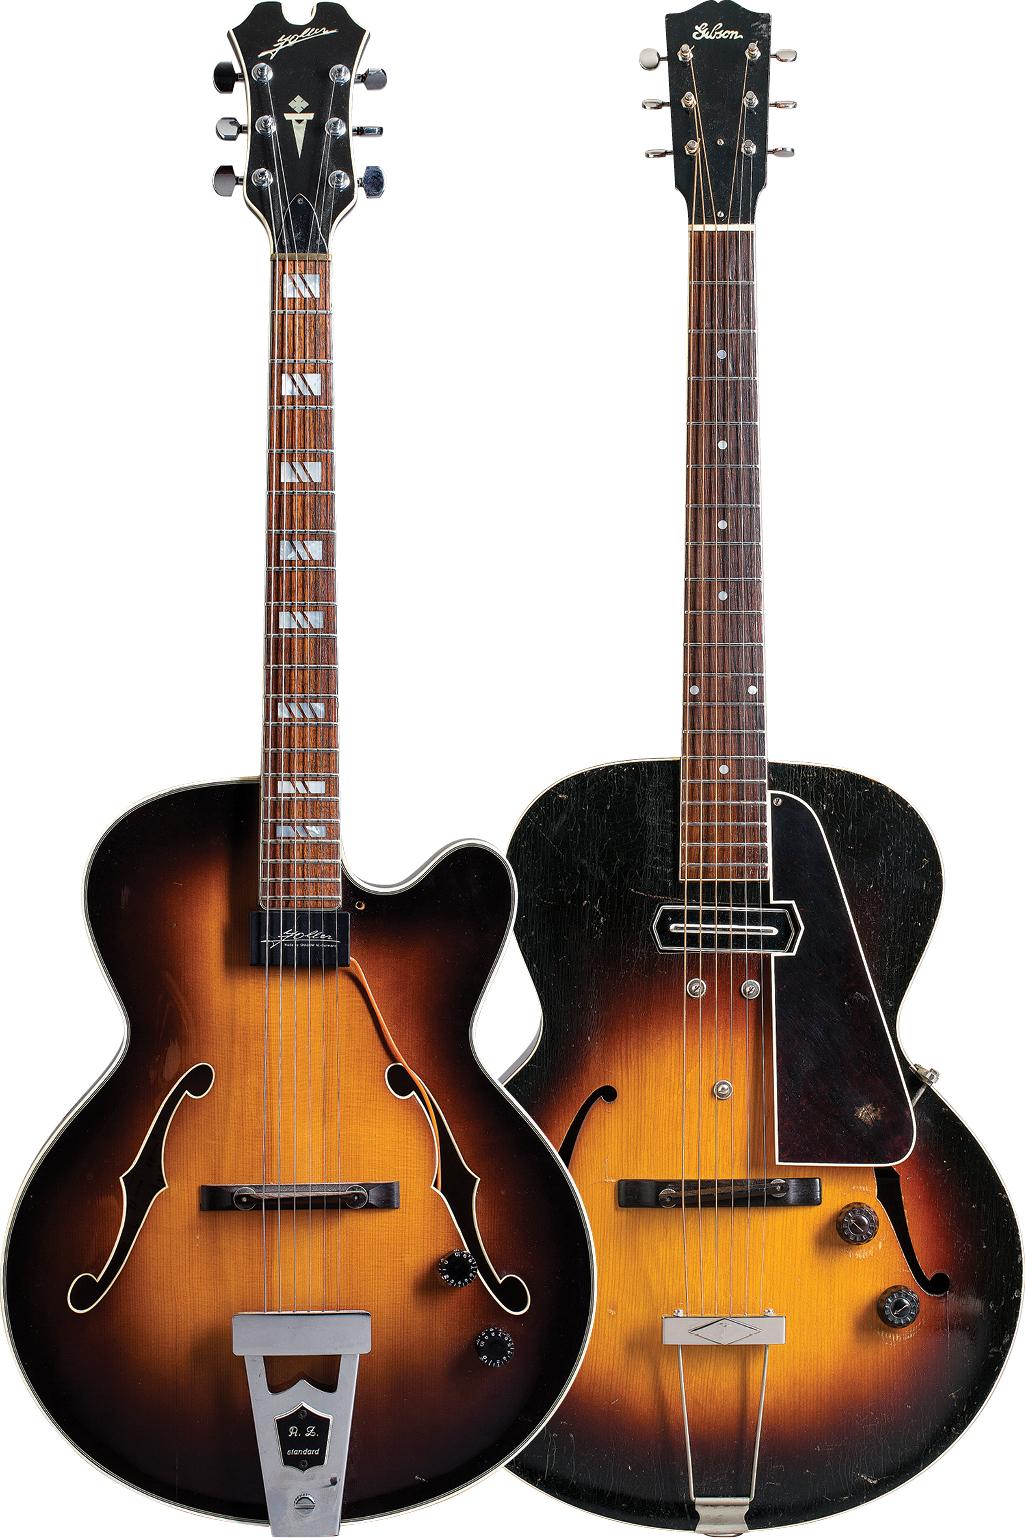 Pat Metheny | Vintage Guitar® magazine